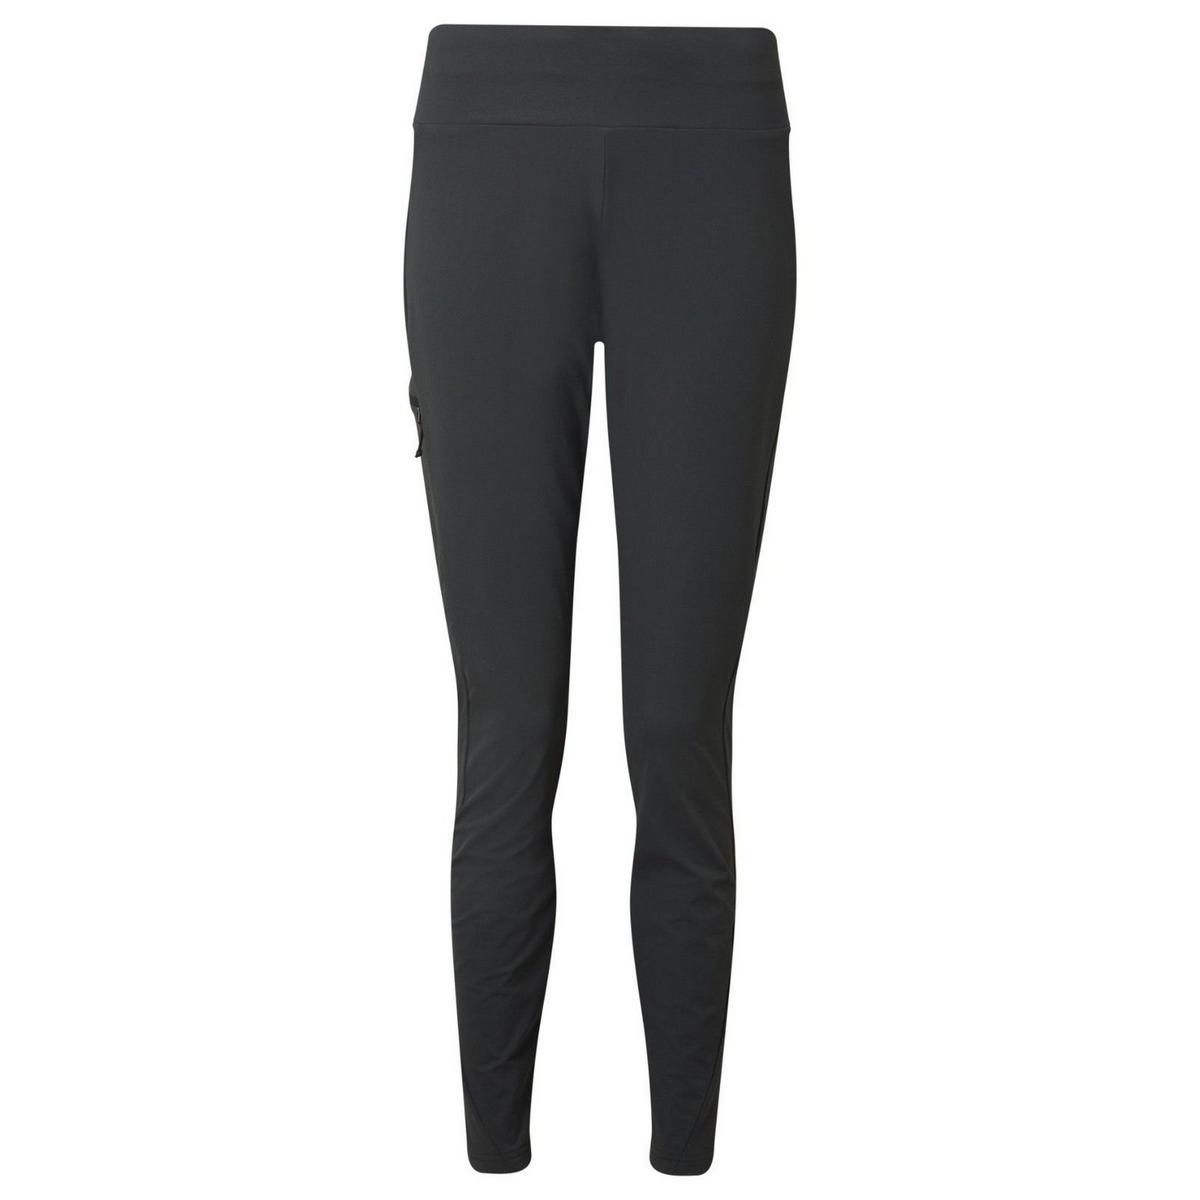 Rab Women's Elevation Pants - Beluga